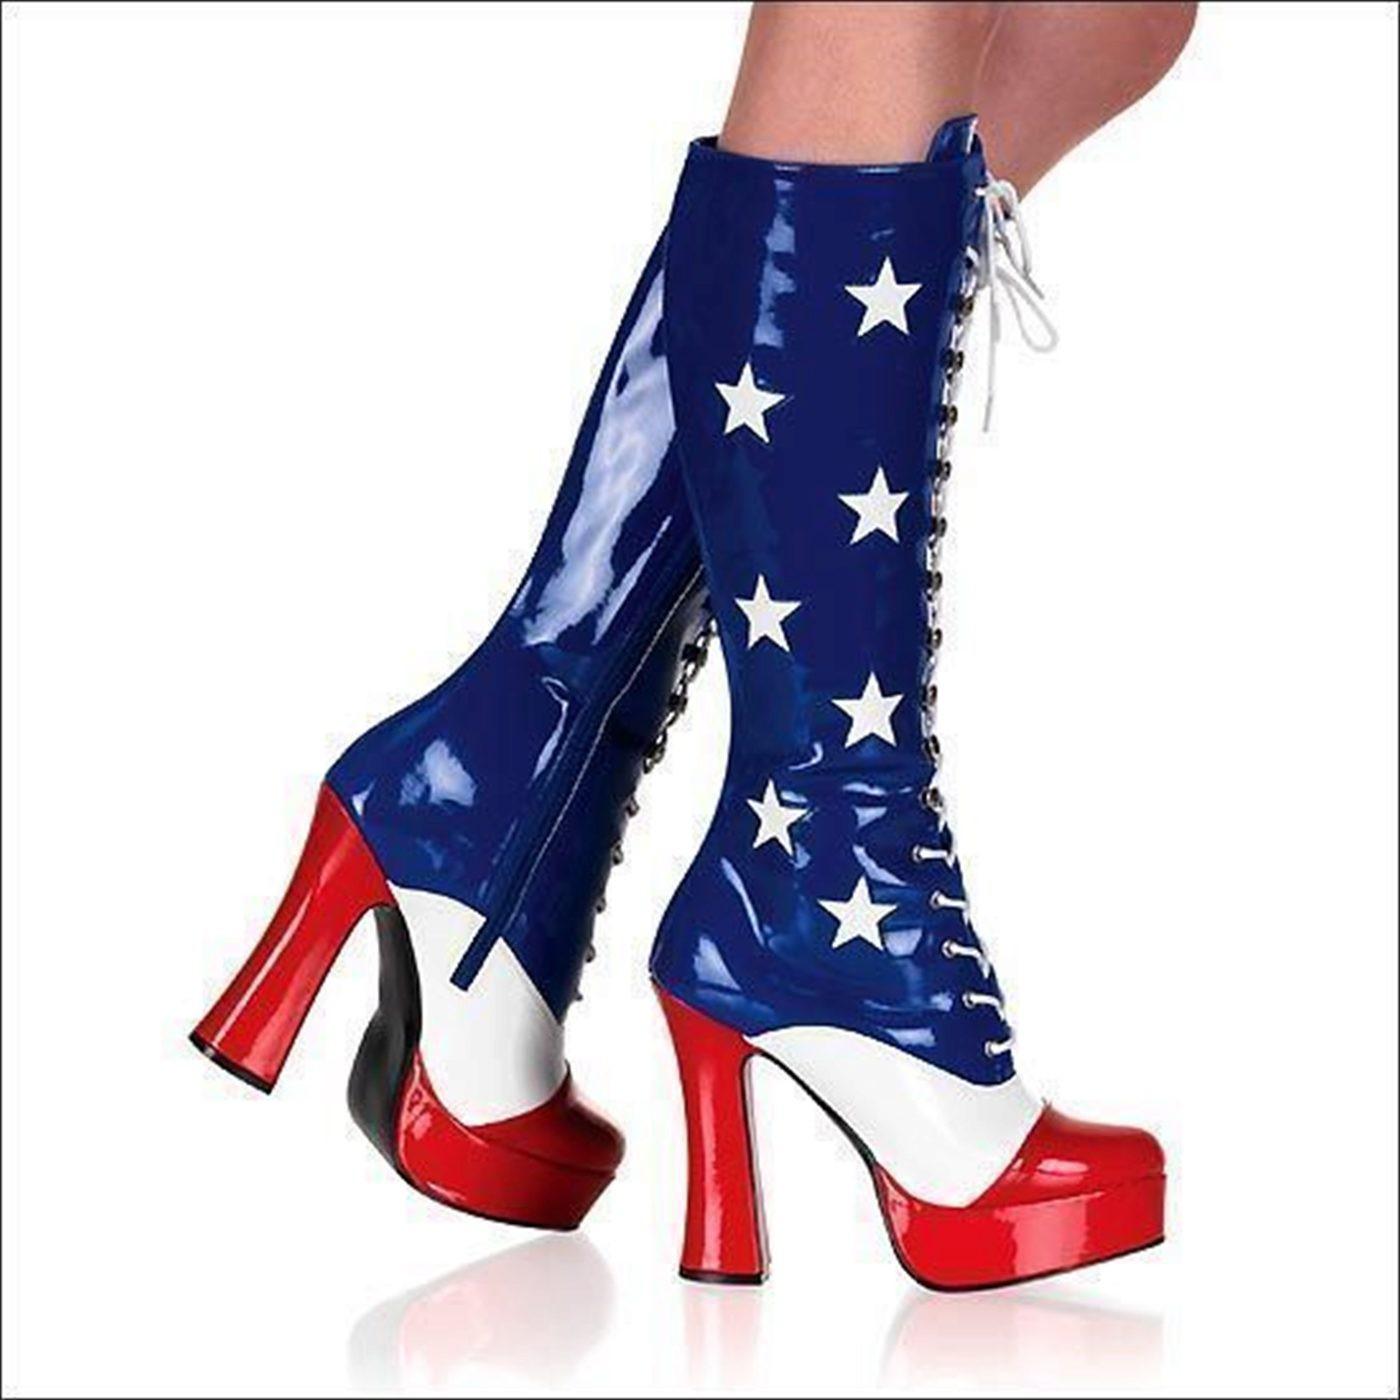 Wonder Patriot Woman Boots 5 Inch Heel